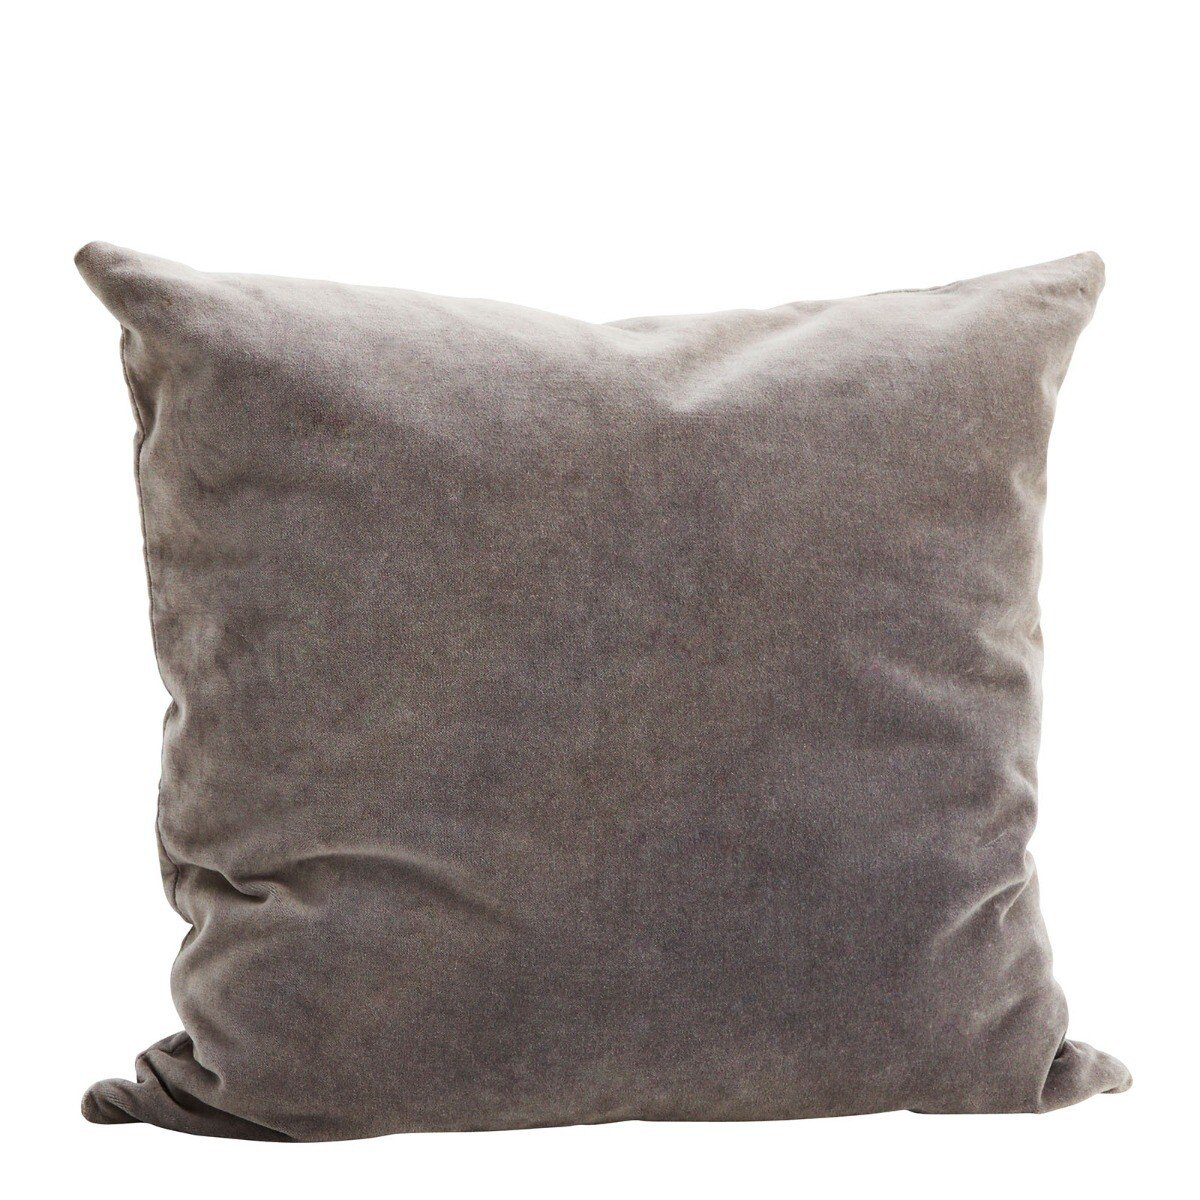 Madam Stoltz kussenhoes velvet donker grijs 50 x 50